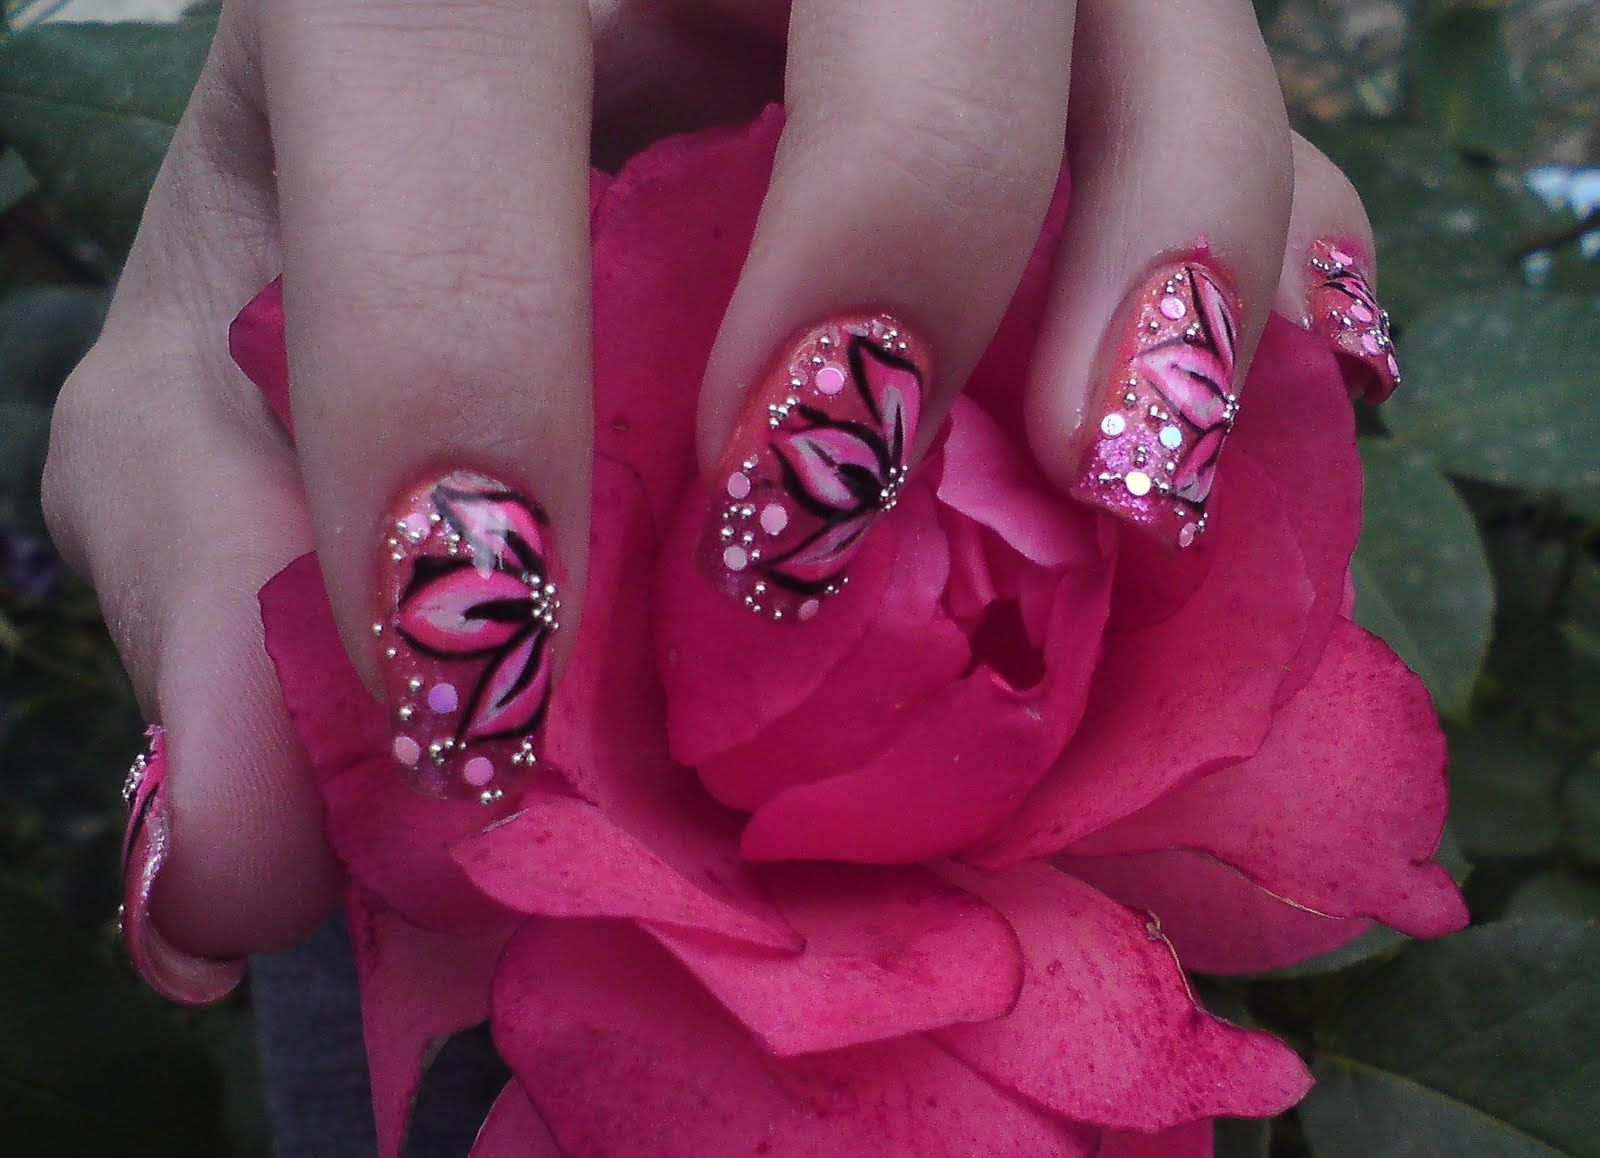 The idea of using animal print nail designs as part of nail art to